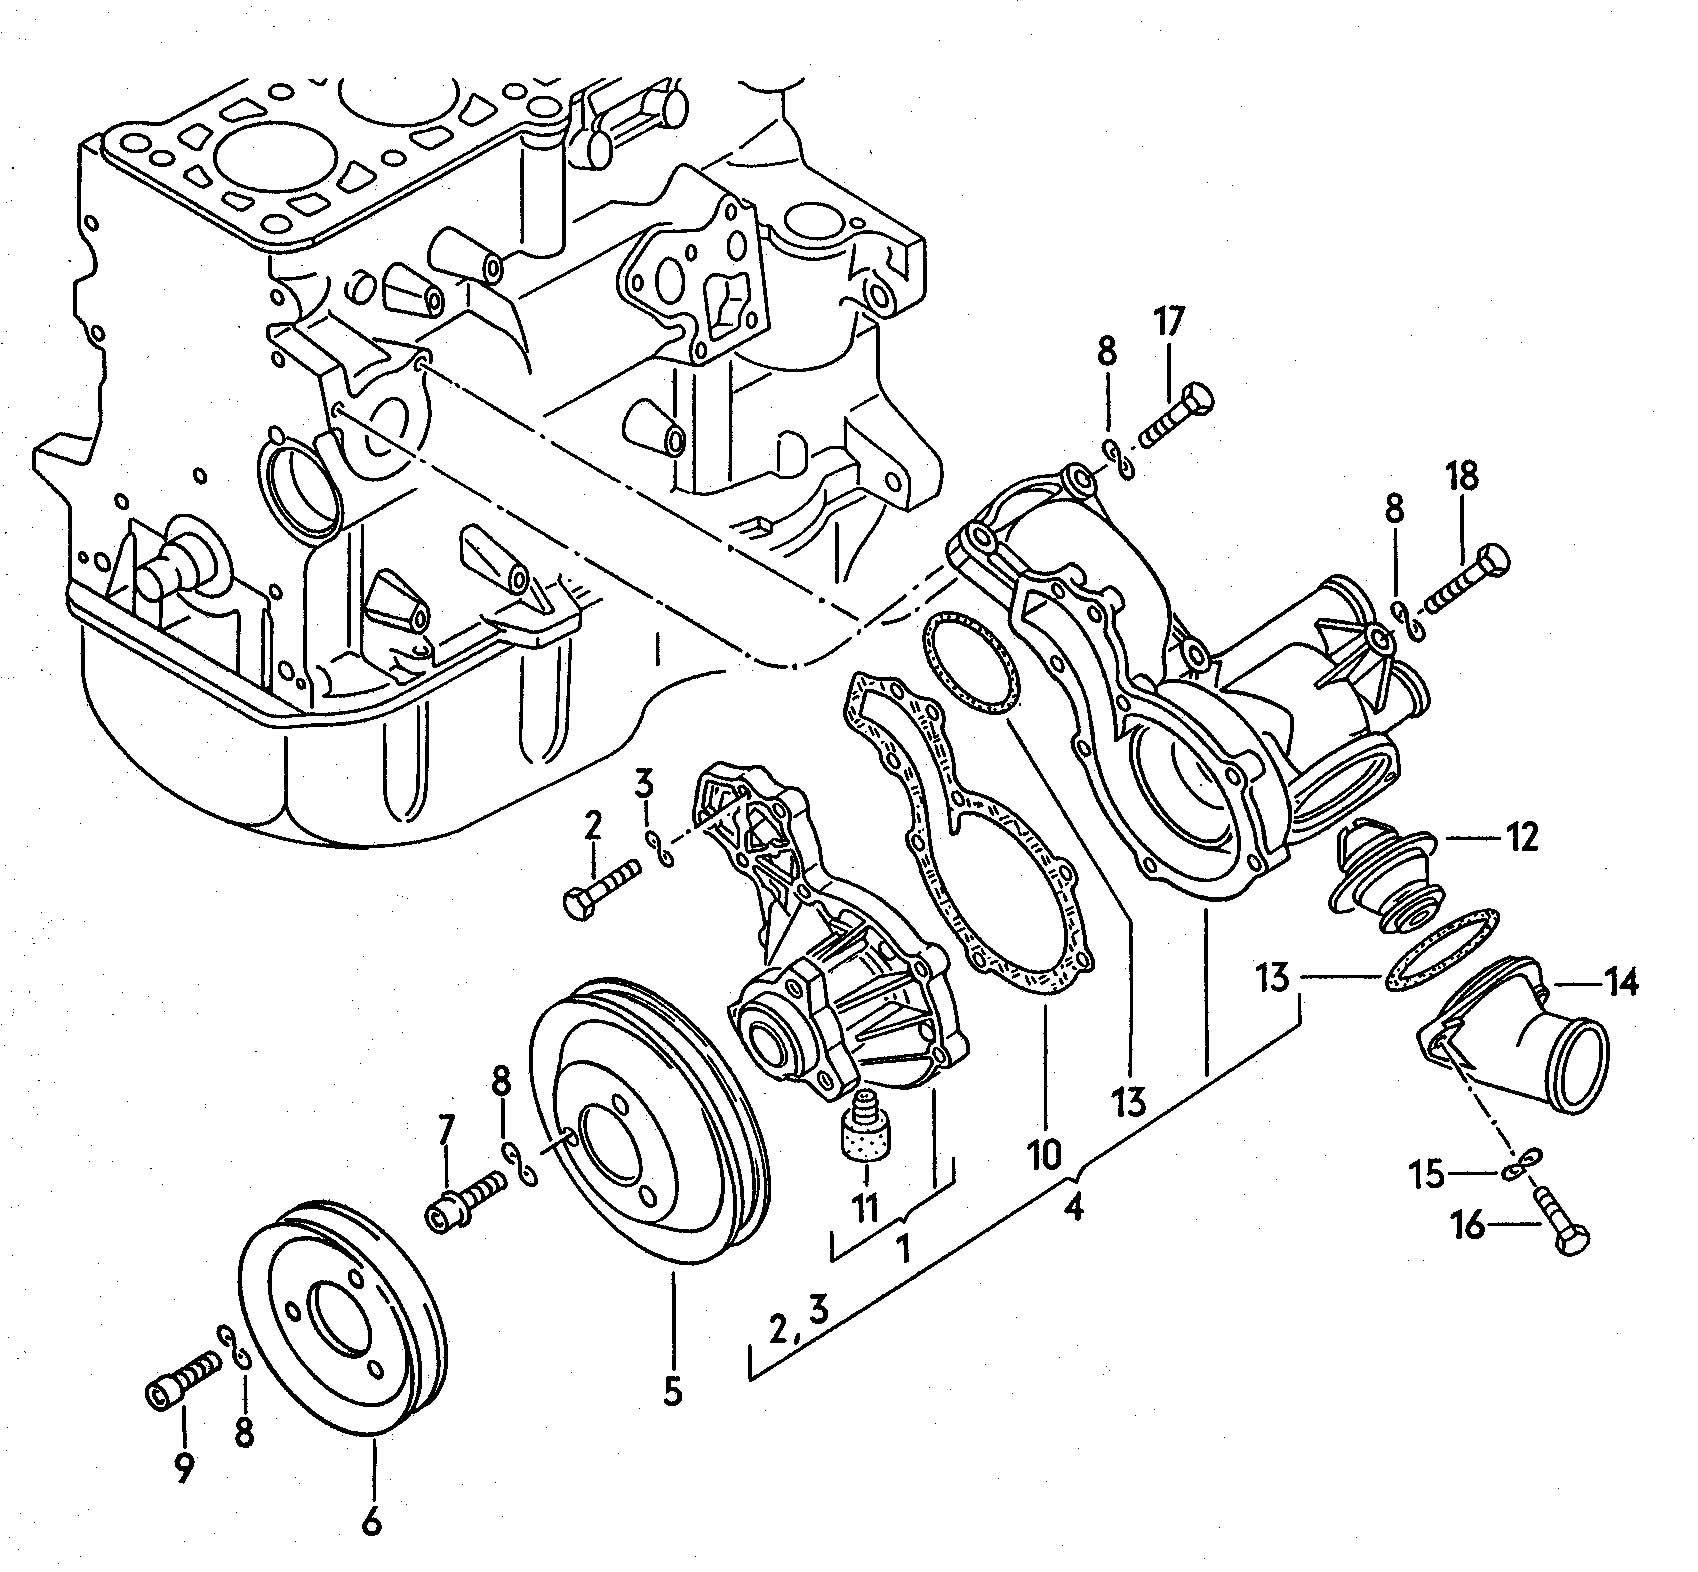 Best Axe Yamaha G14 Golf Cart Wiring Diagram Gallery - Electrical ...